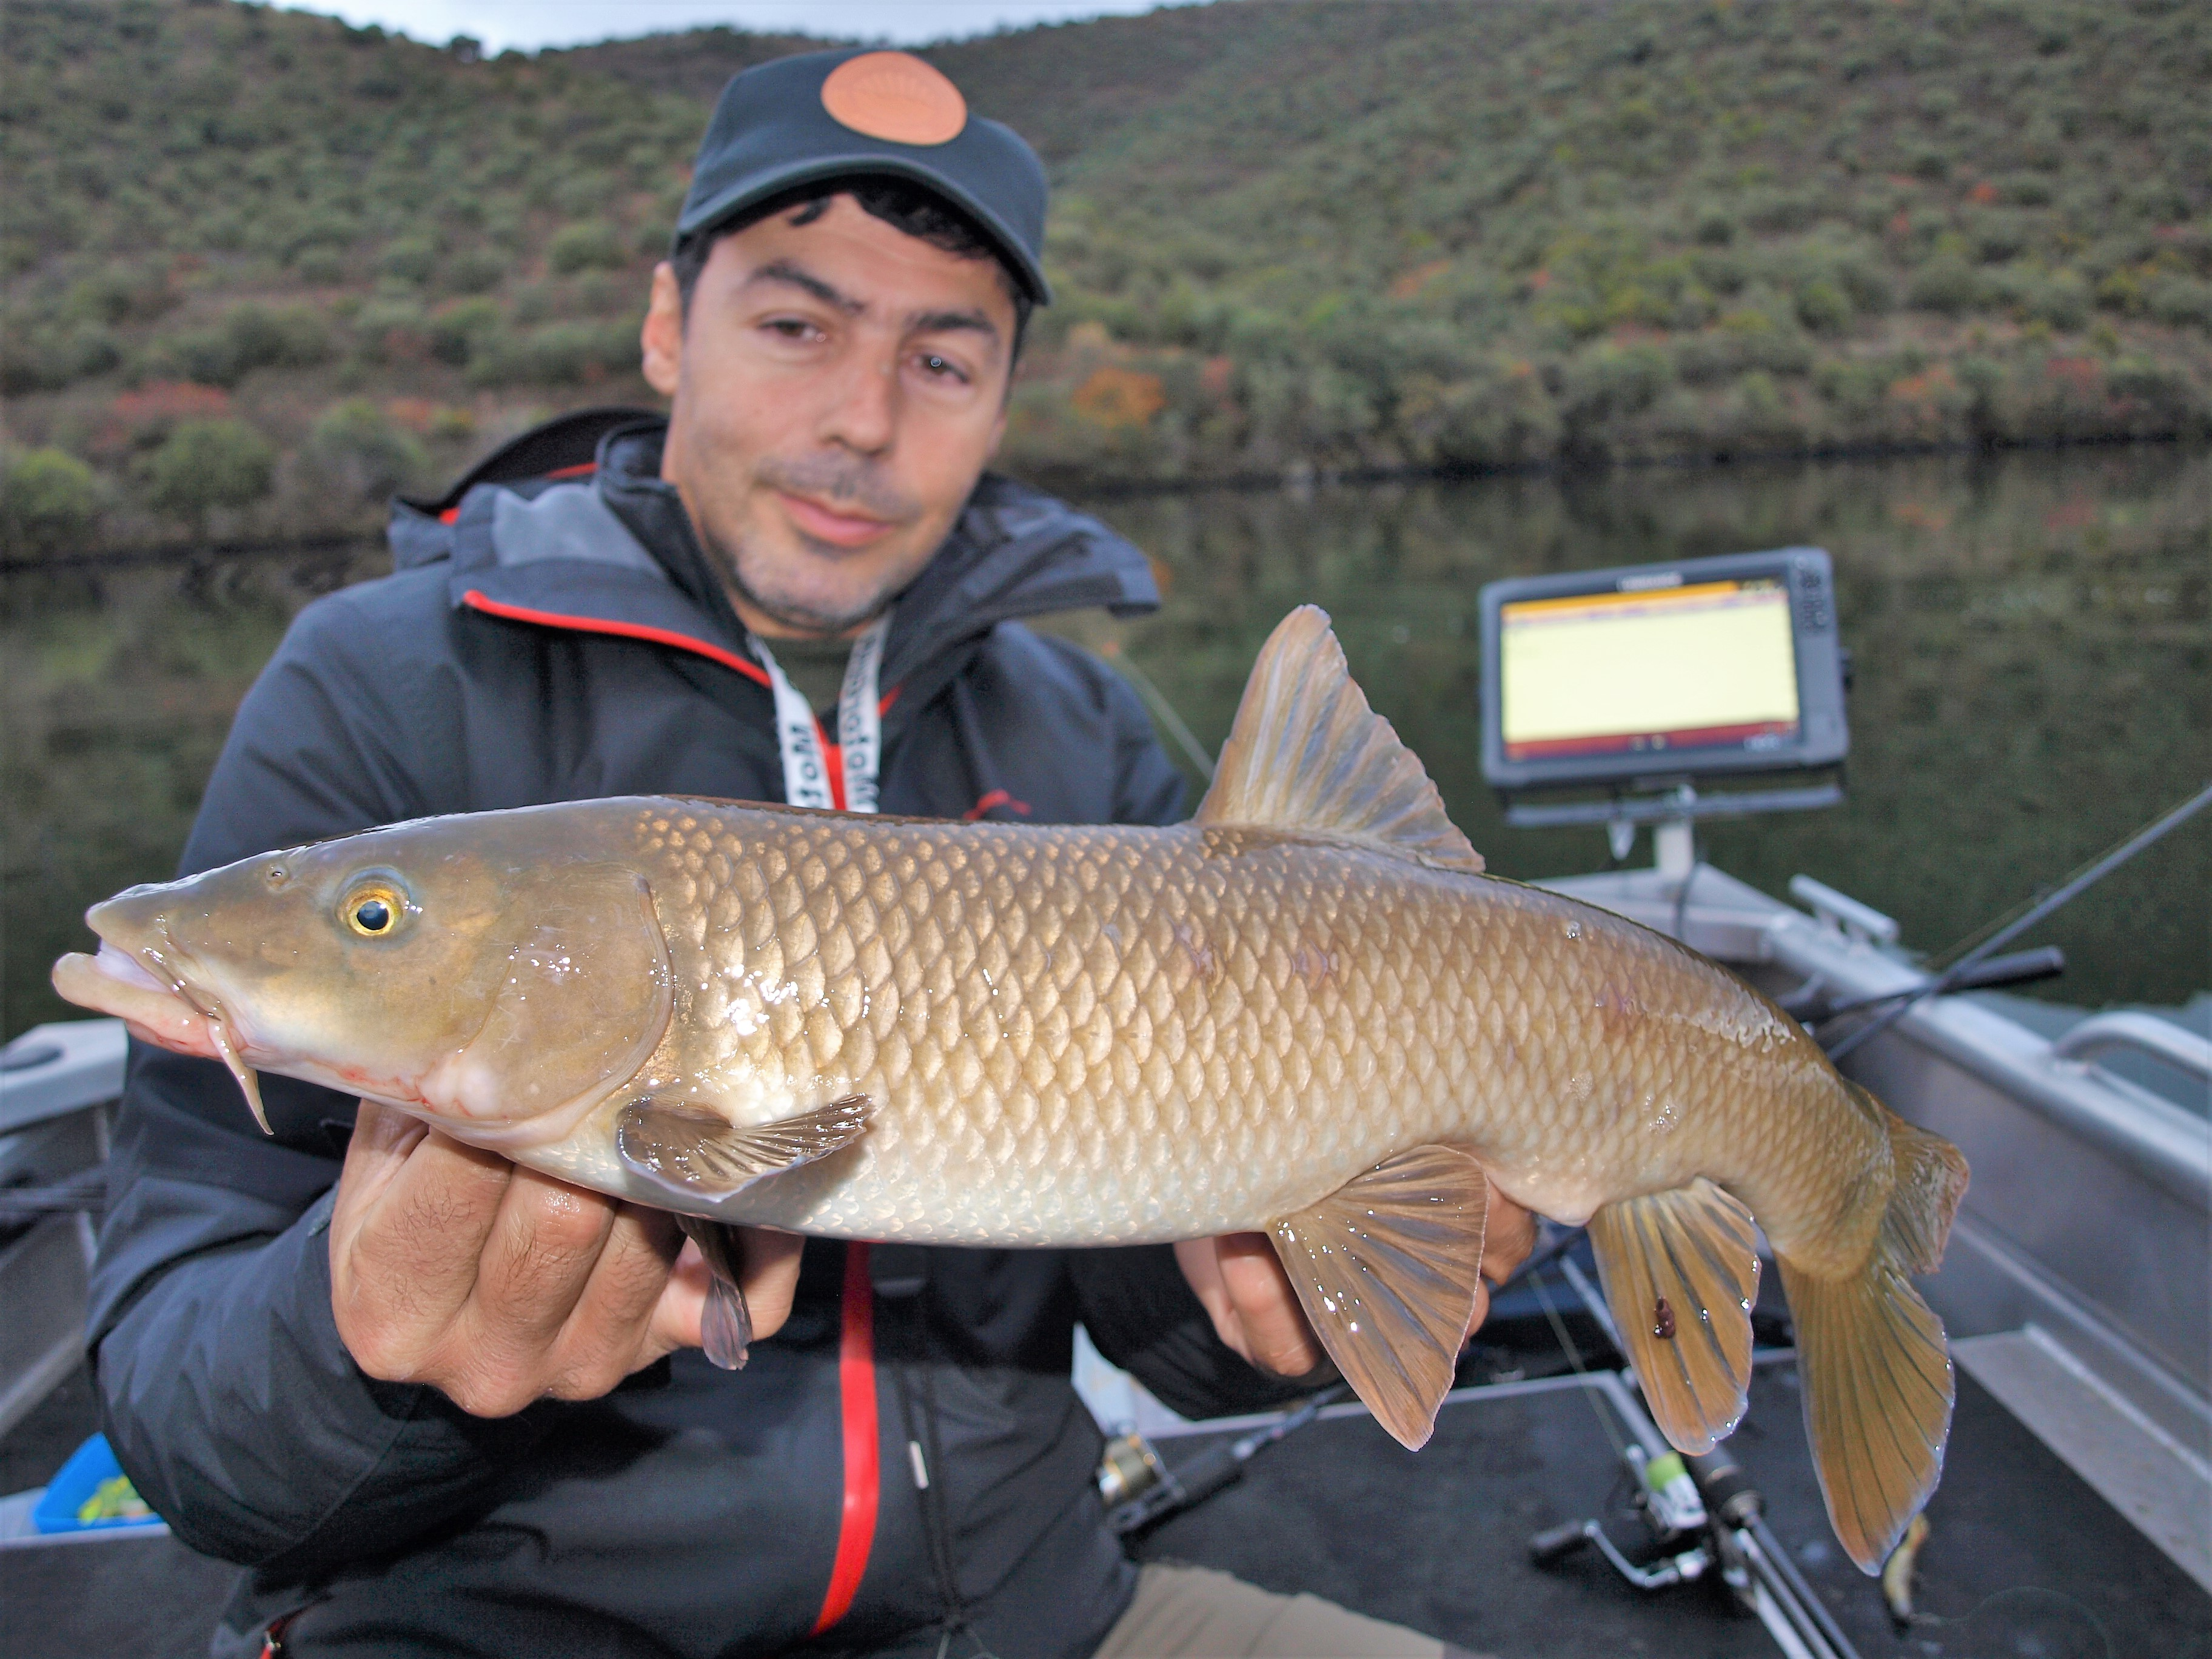 Pêche du barbeau au Portugal